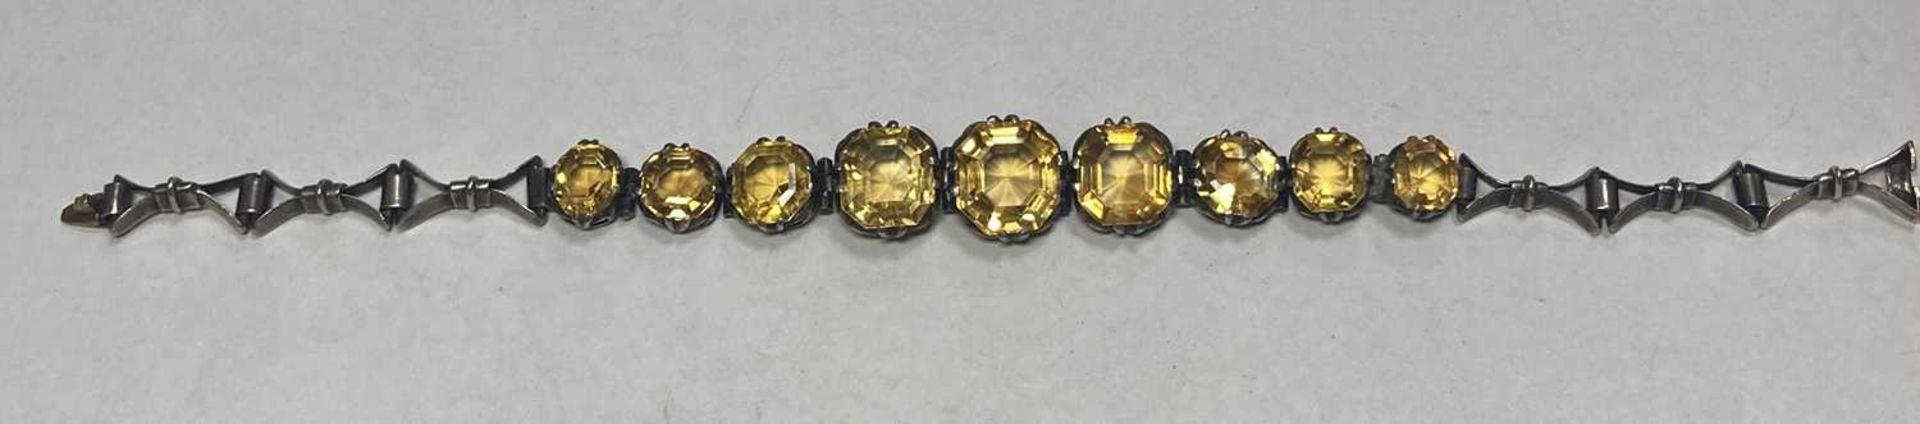 A silver citrine bracelet, - Image 6 of 8